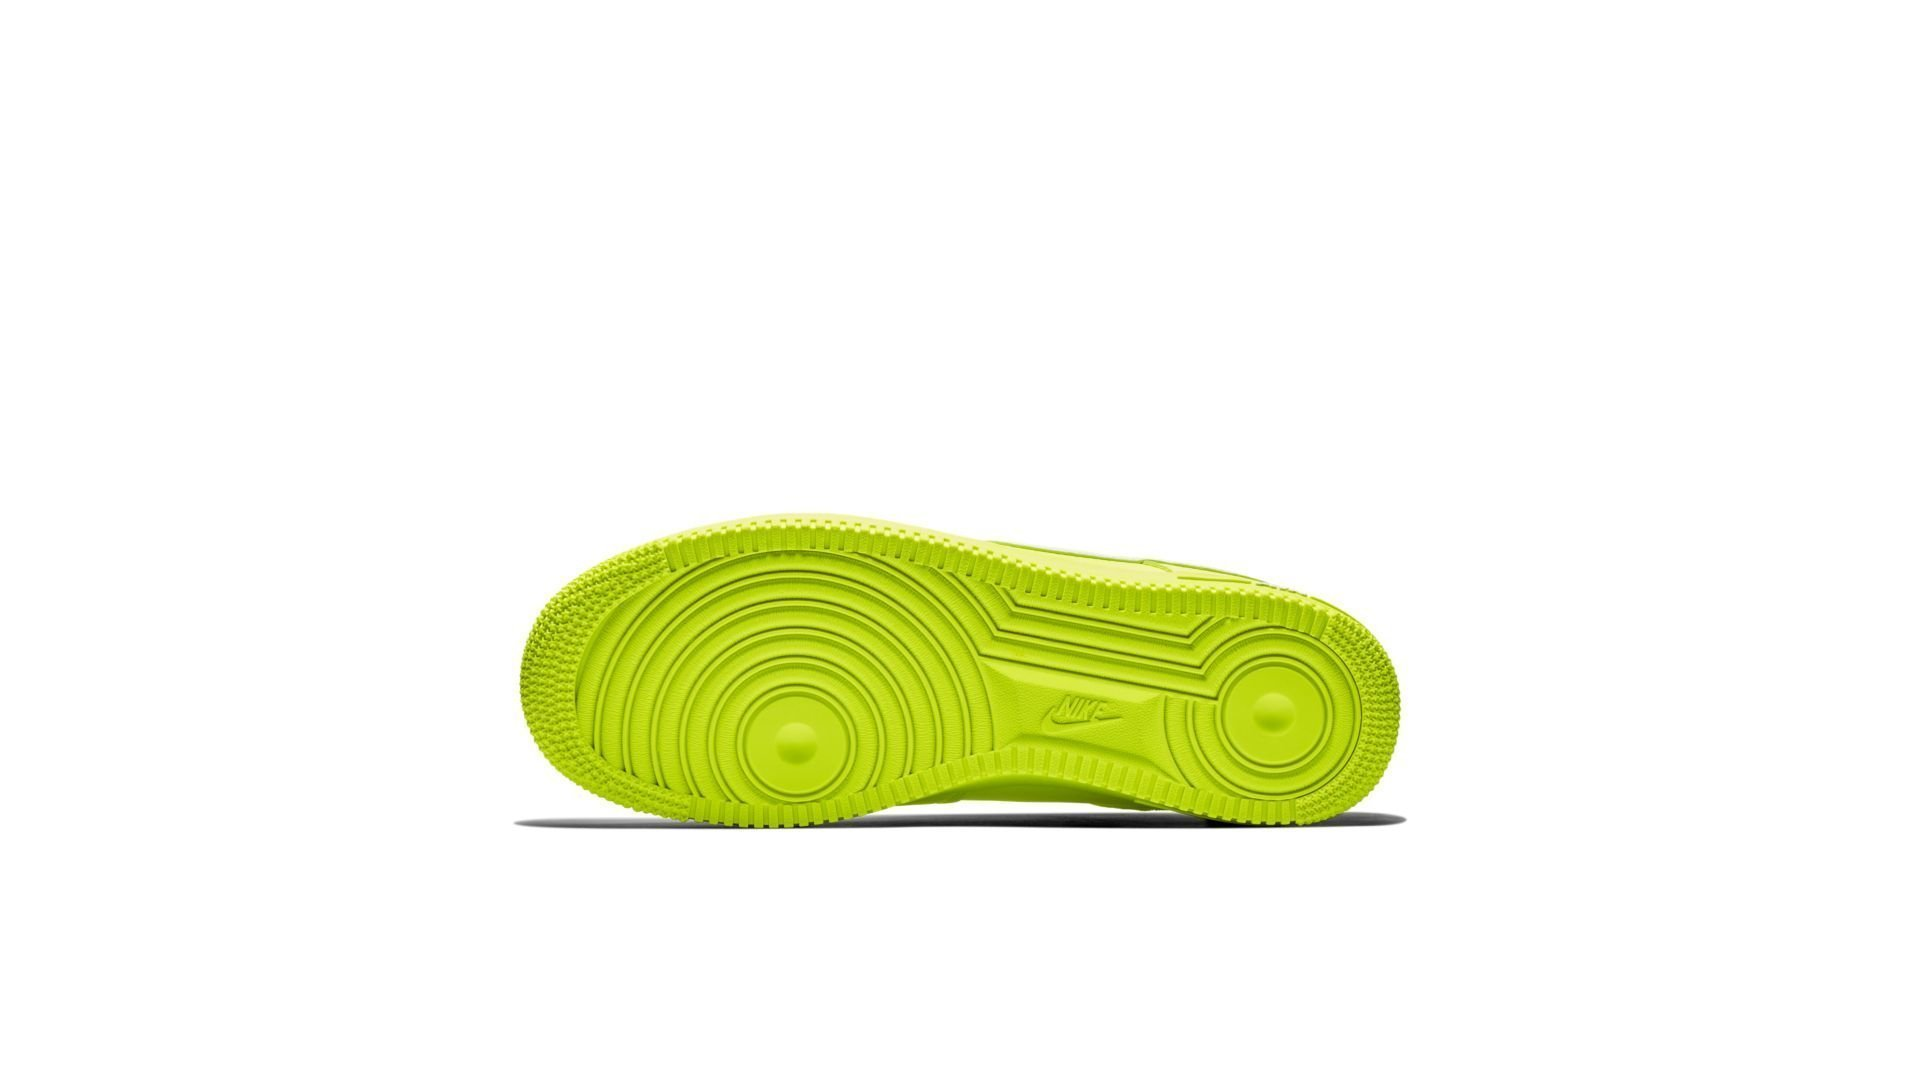 Nike Air Force AJ7747-700